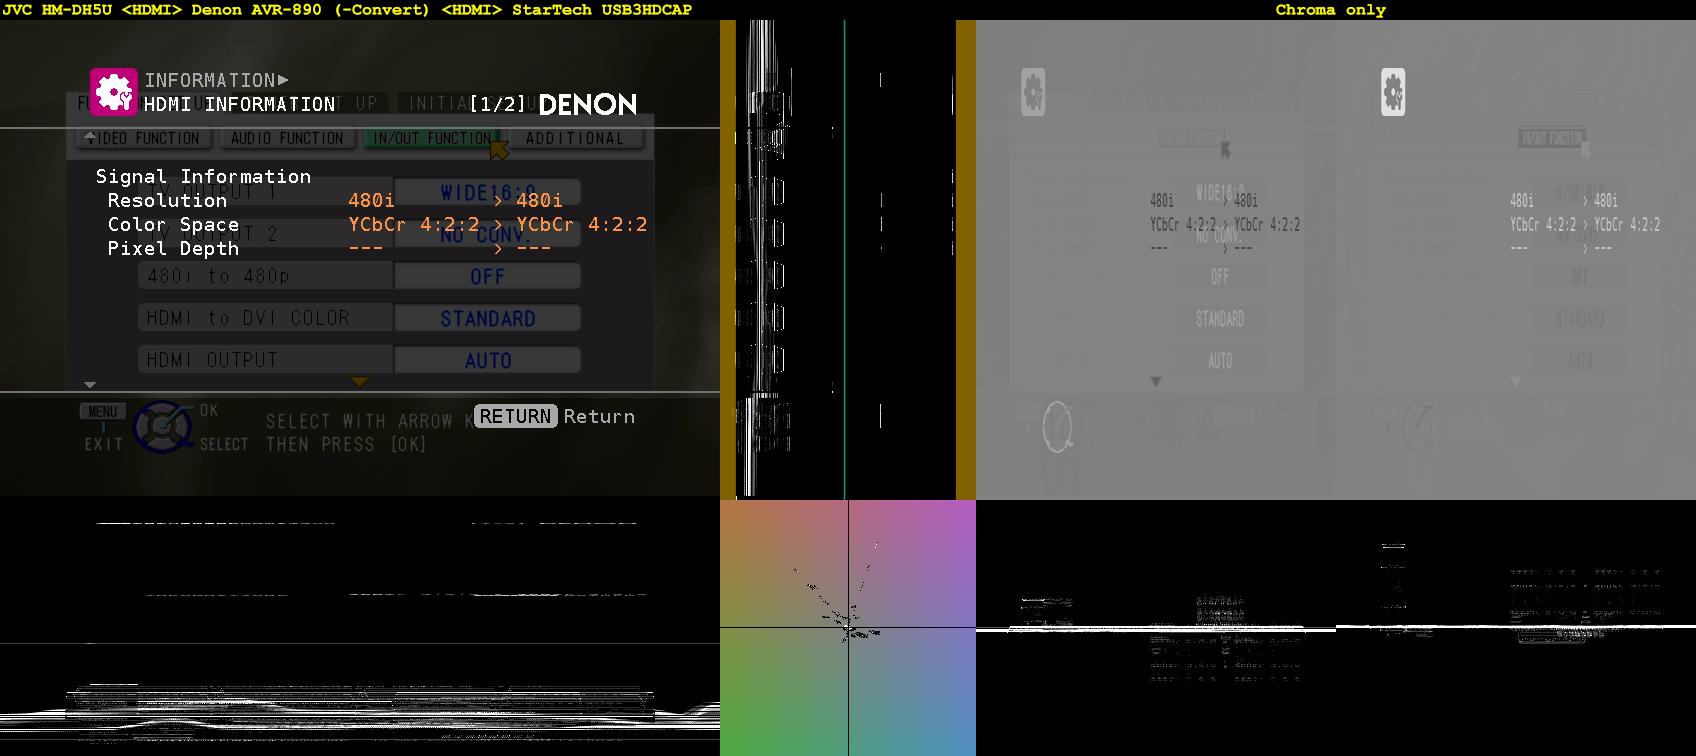 Click image for larger version  Name:Menu + Info - JVC HM-DH5U =HDMI= Denon AVR-890, -Convert =HDMI= StarTech USB3HDCAP.png Views:3187 Size:329.2 KB ID:35271